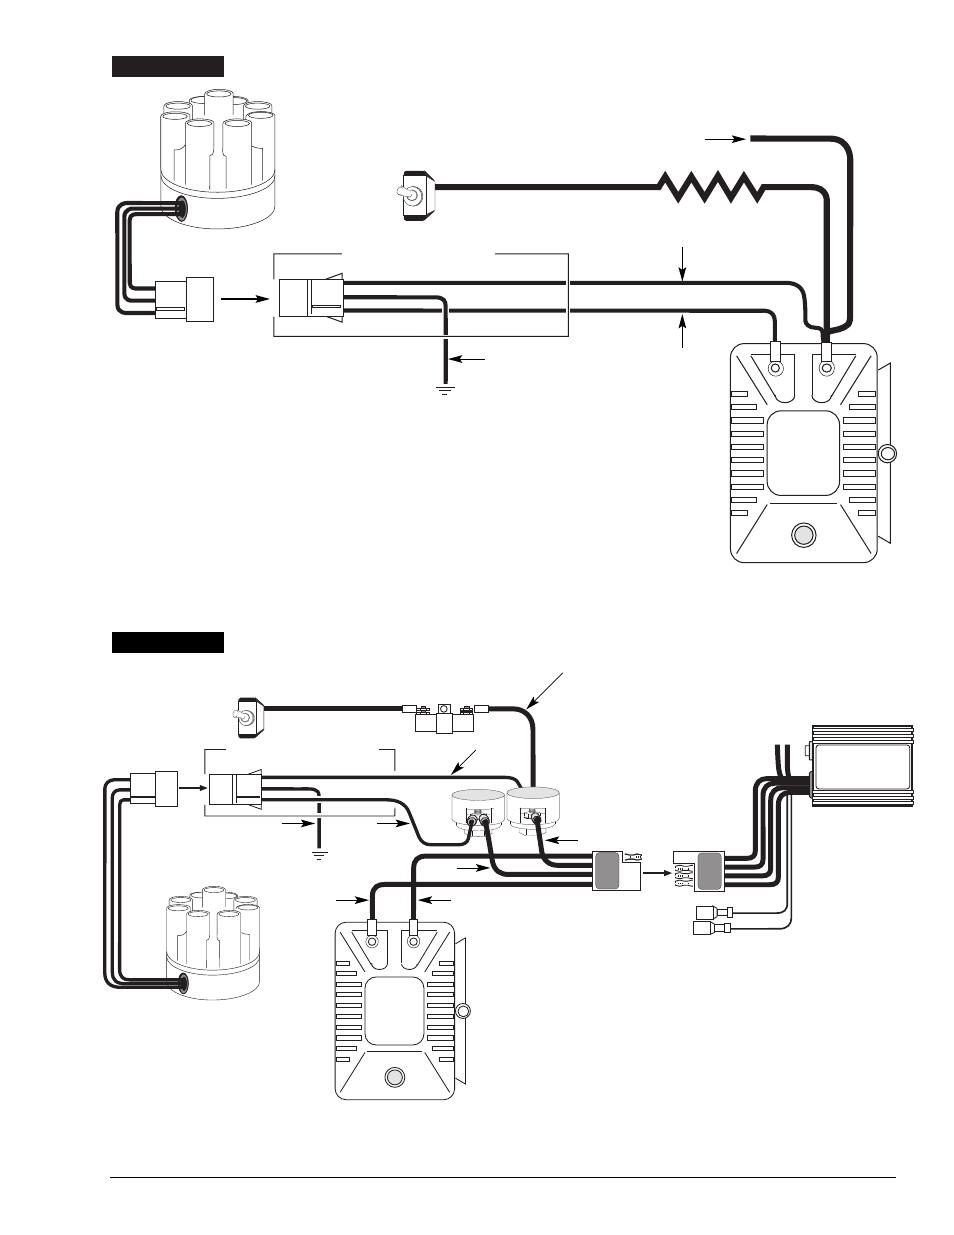 Mallory Flathead Distributor Wiring Auto Electrical Wiring Diagram \u2022 Mallory  Unilite Ignition Module Mallory Ignition Wiring Diagram 5072001